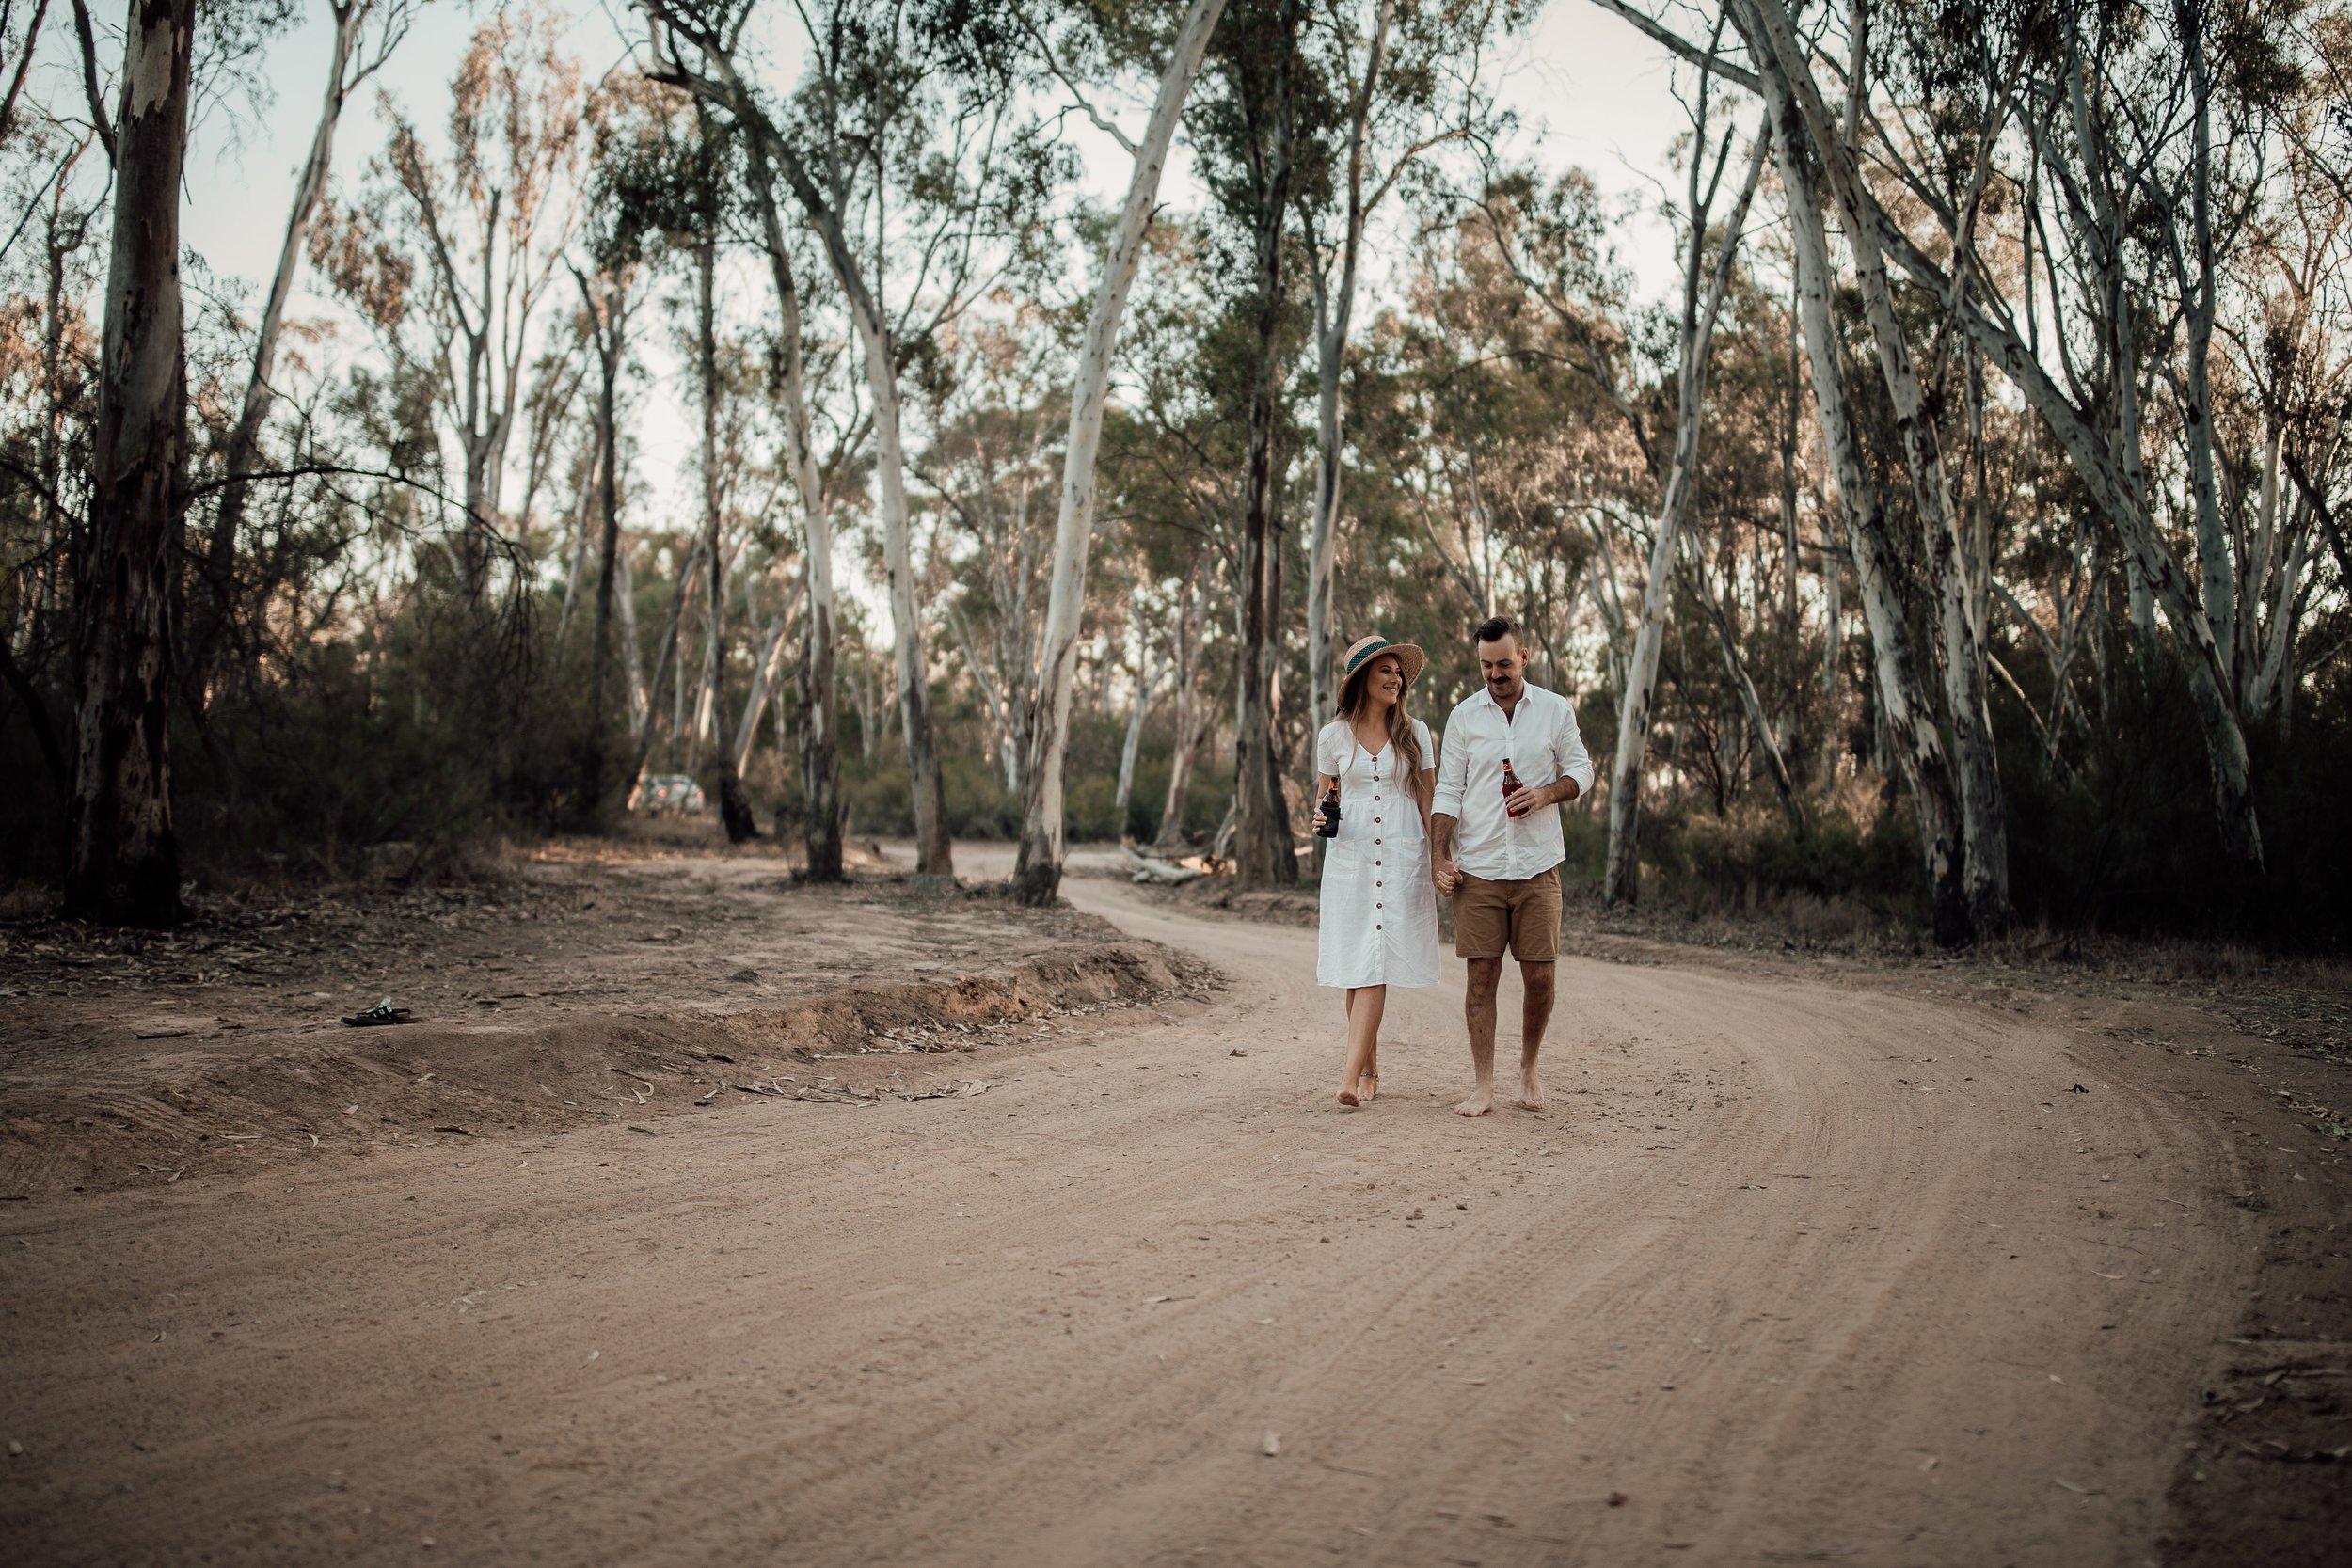 mickalathomas_puremacphotography_weddingphotographer_couplephotographer_Sheppartonphotographer_2807.jpg